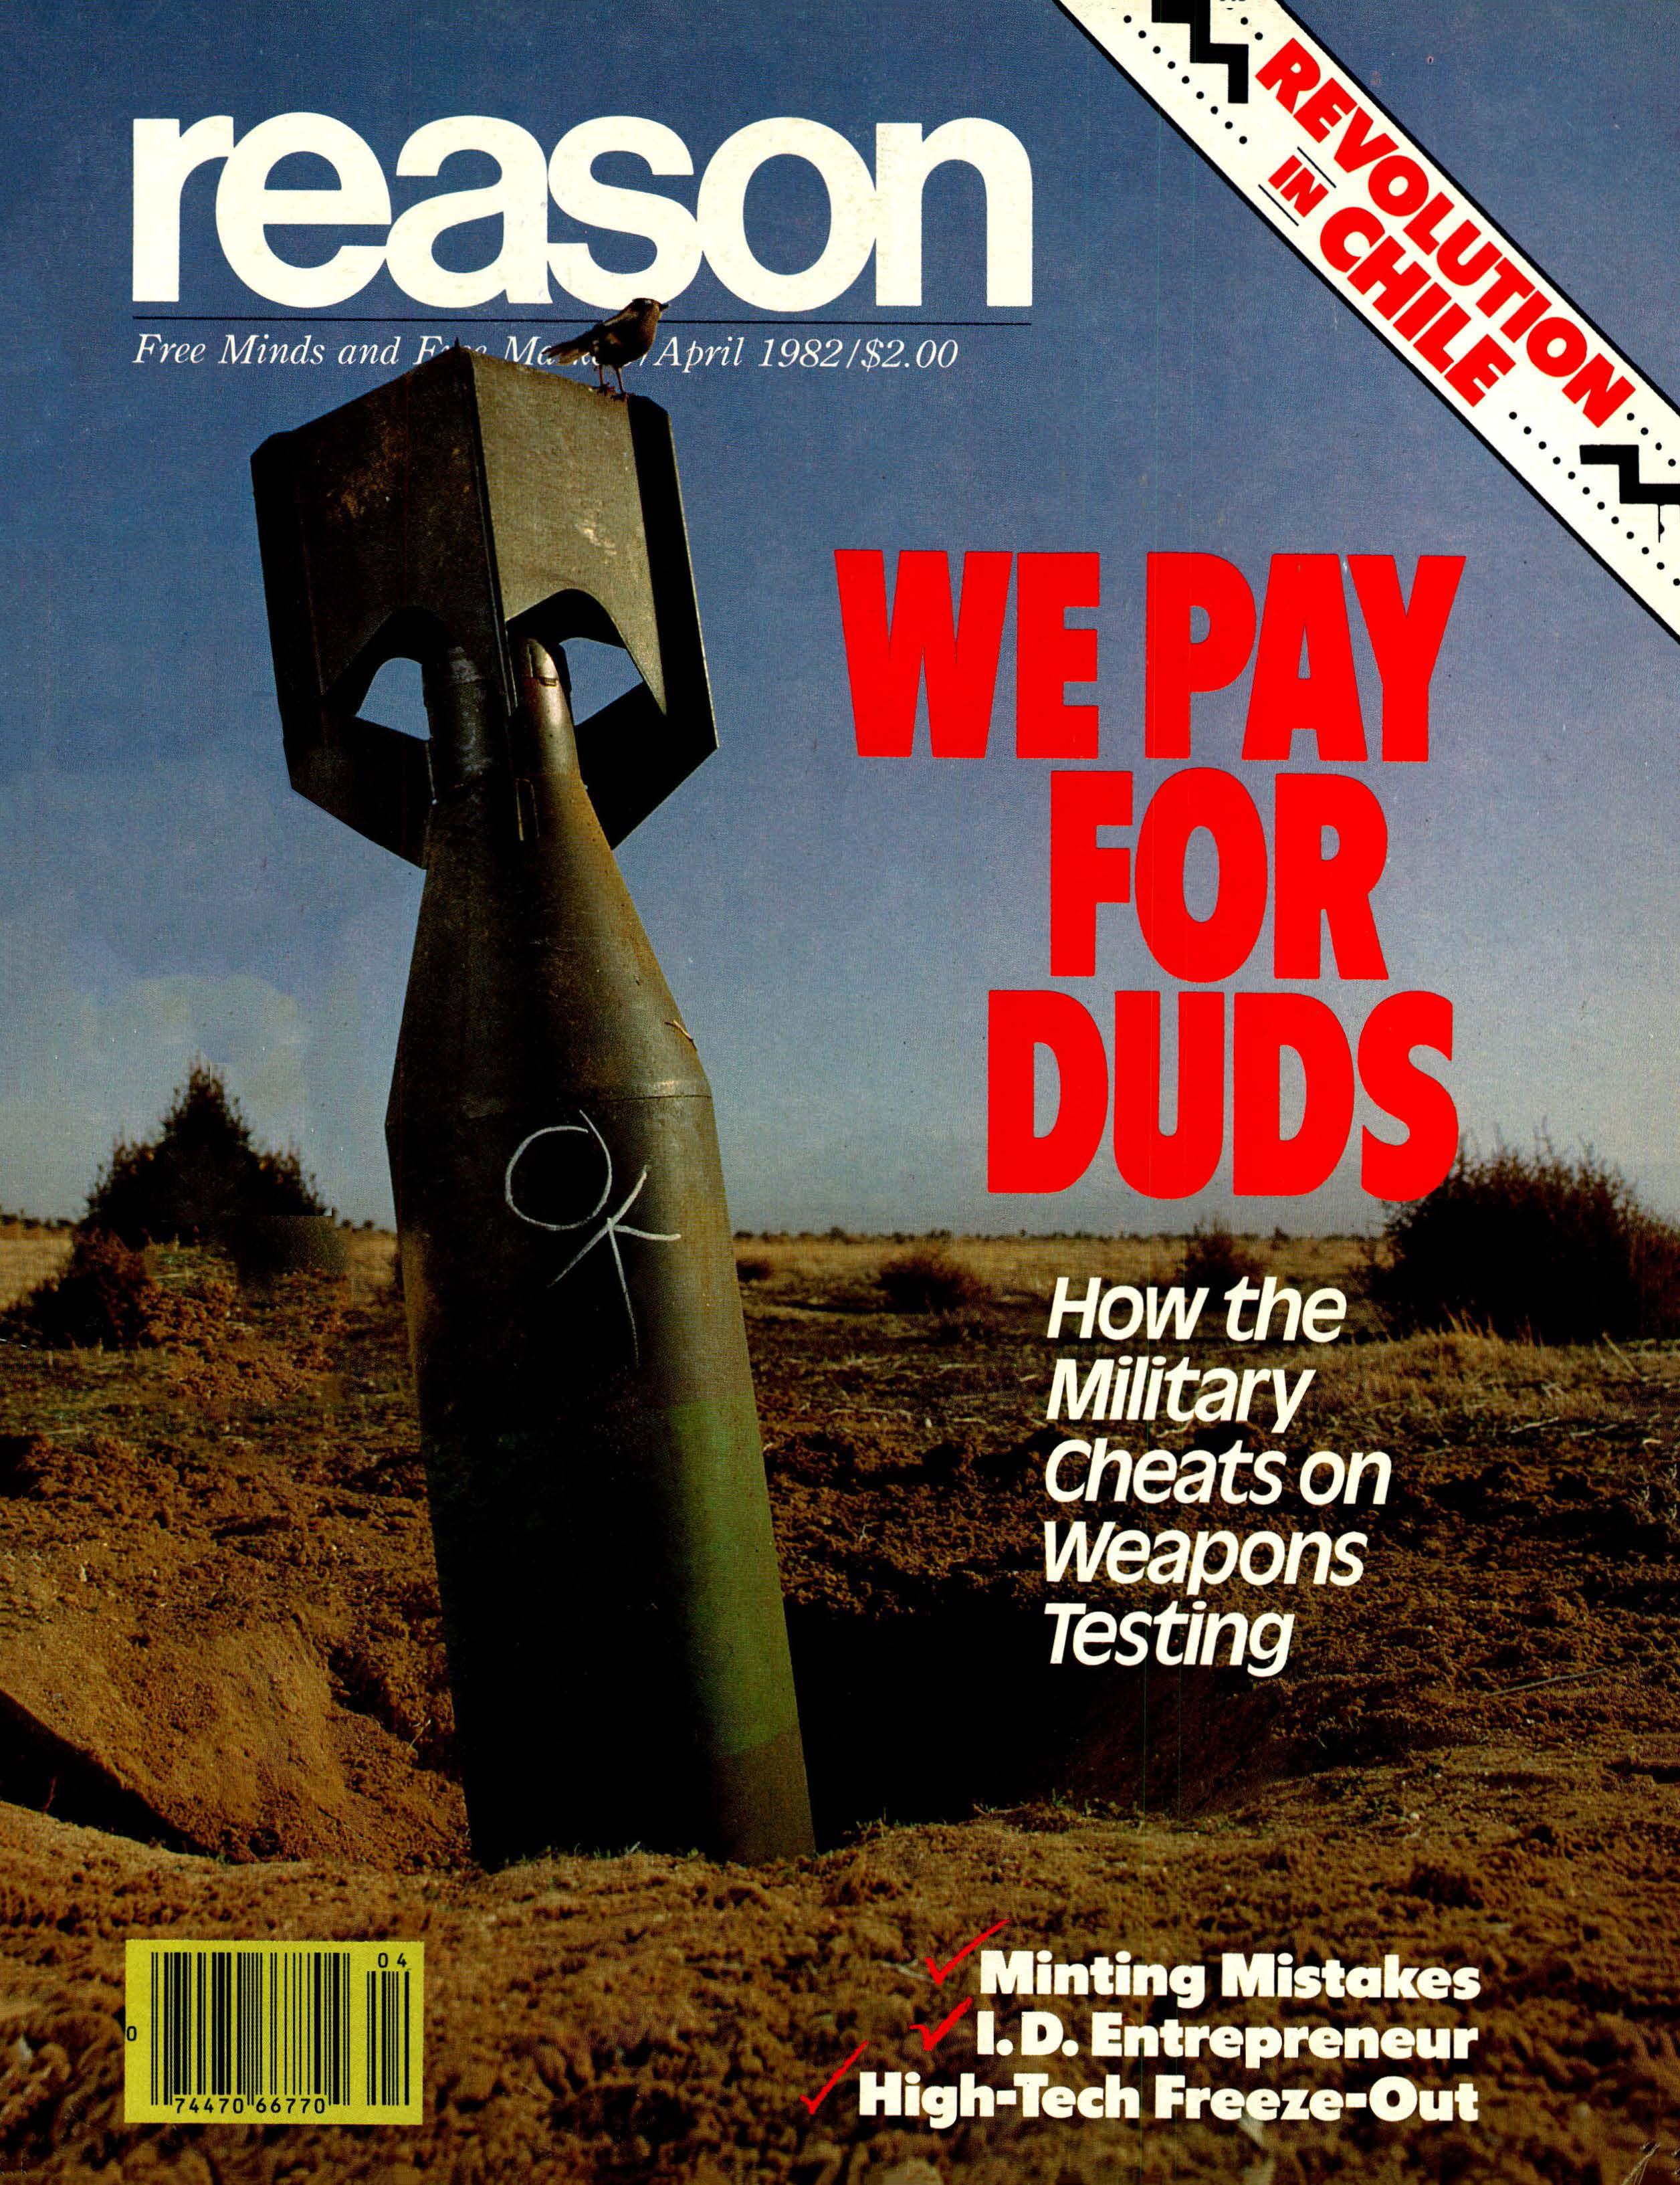 Reason Magazine, April 1982 cover image